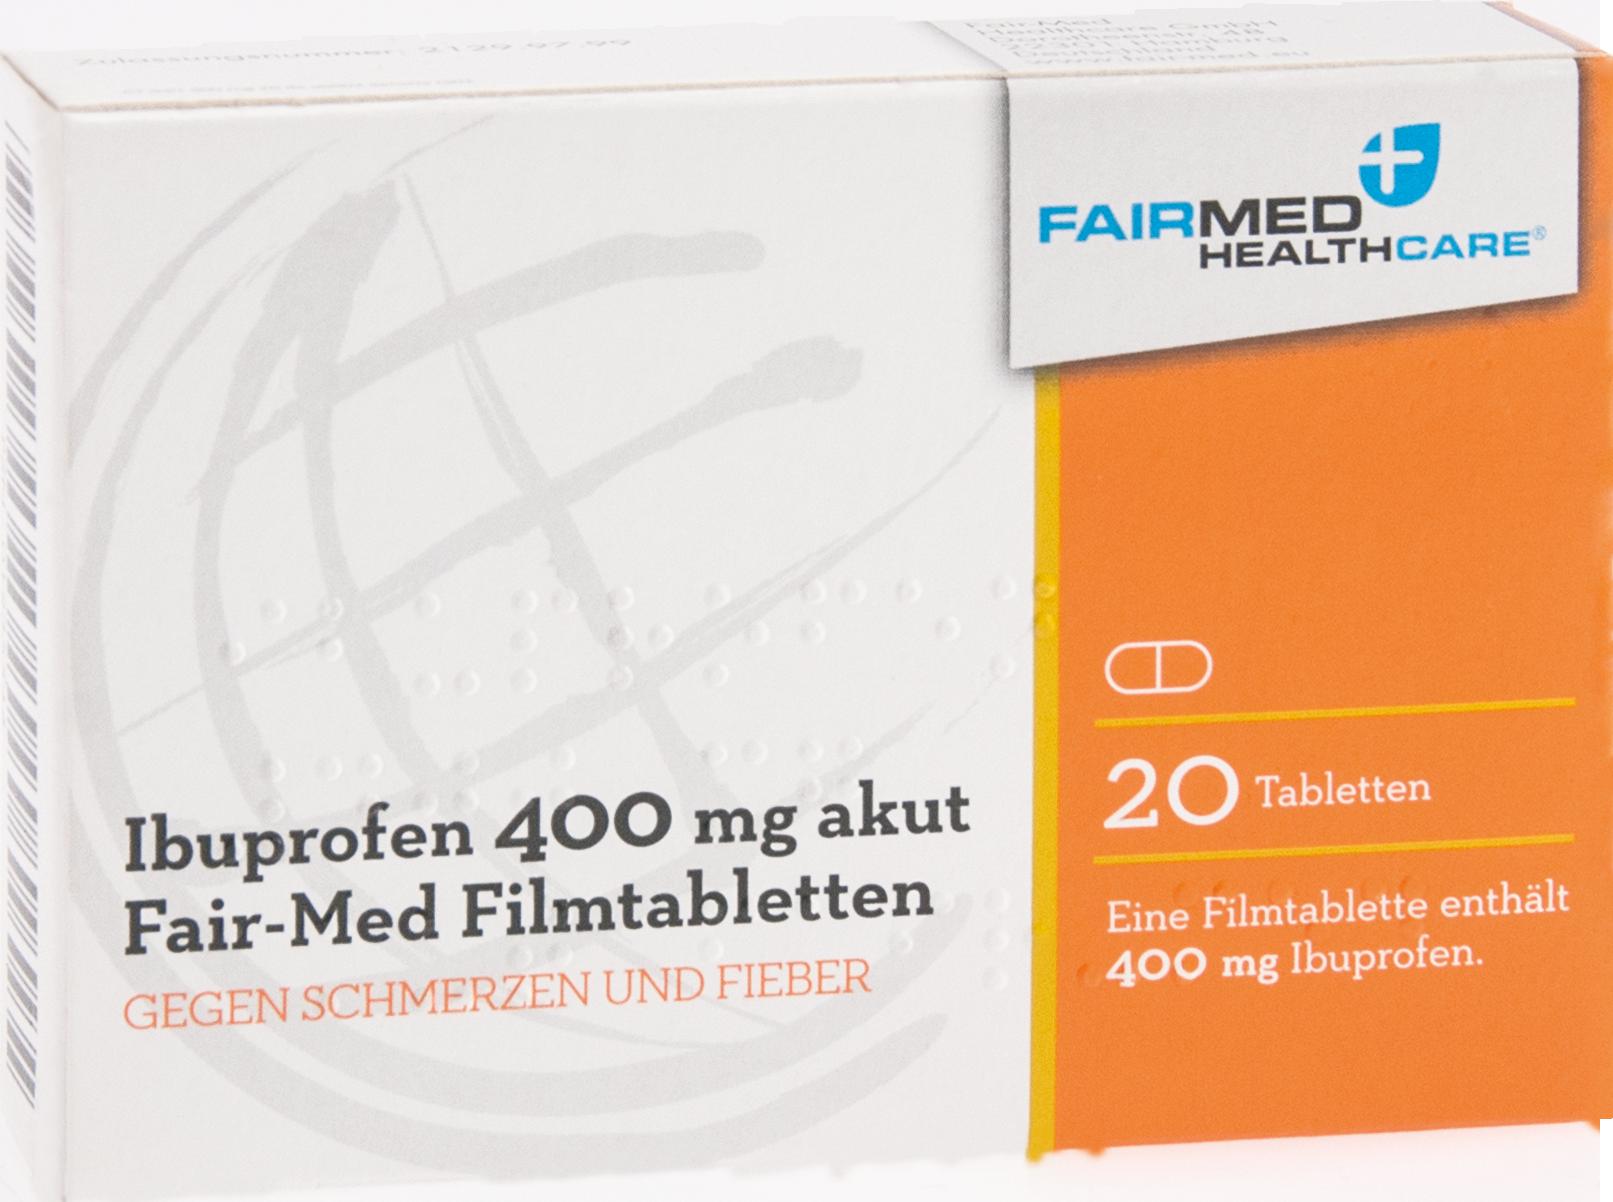 Ibuprofen 400mg akut Fair-Med Healthcare